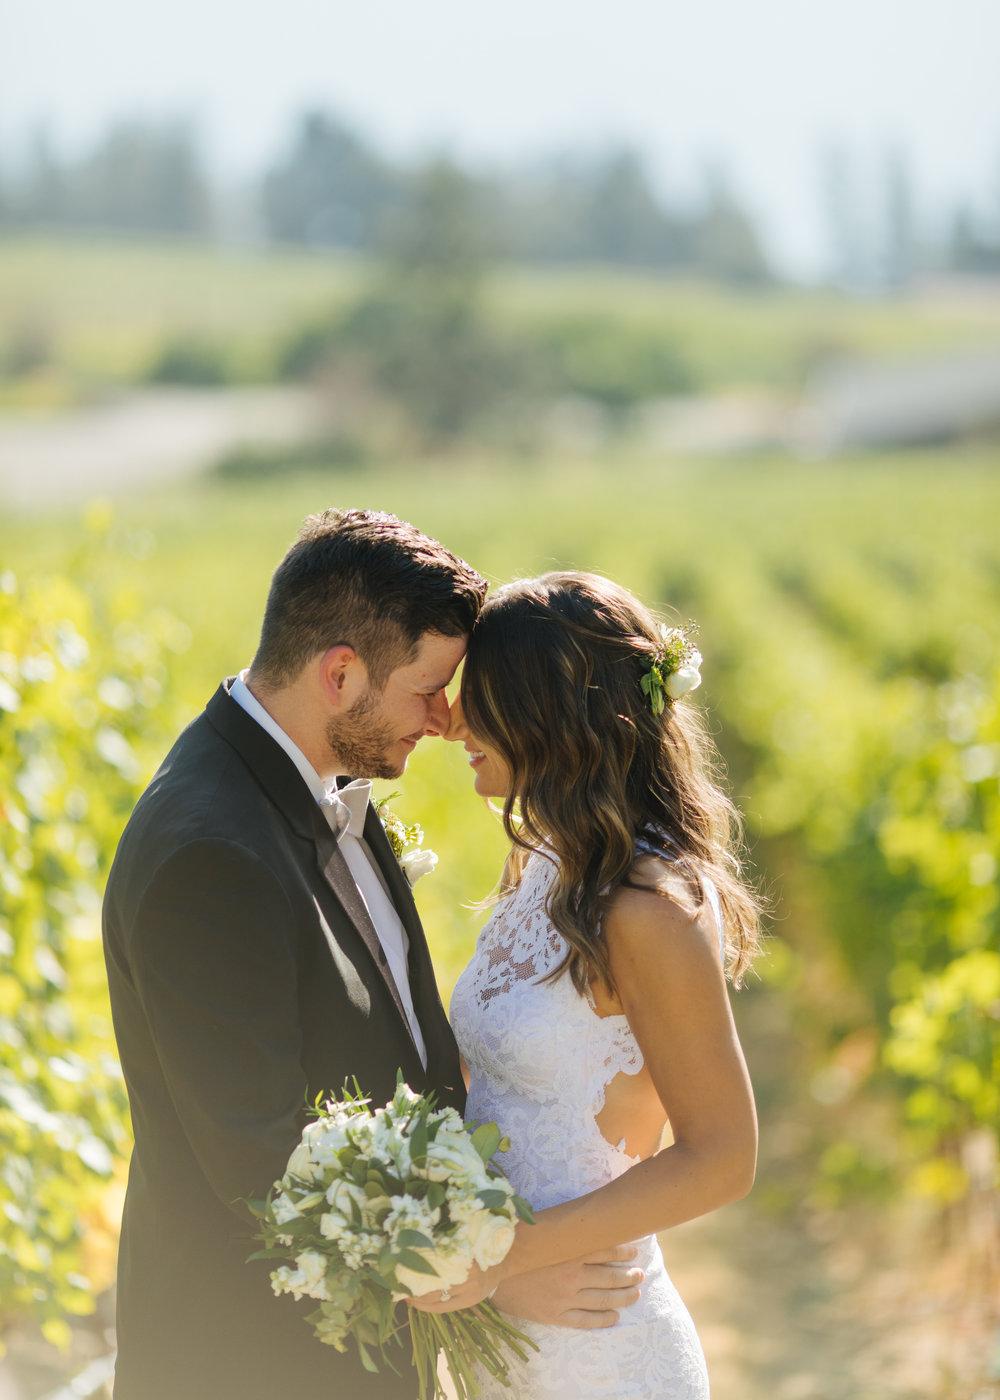 herastudios_wedding_dubravka_ognjen_hera_selects-69.jpg